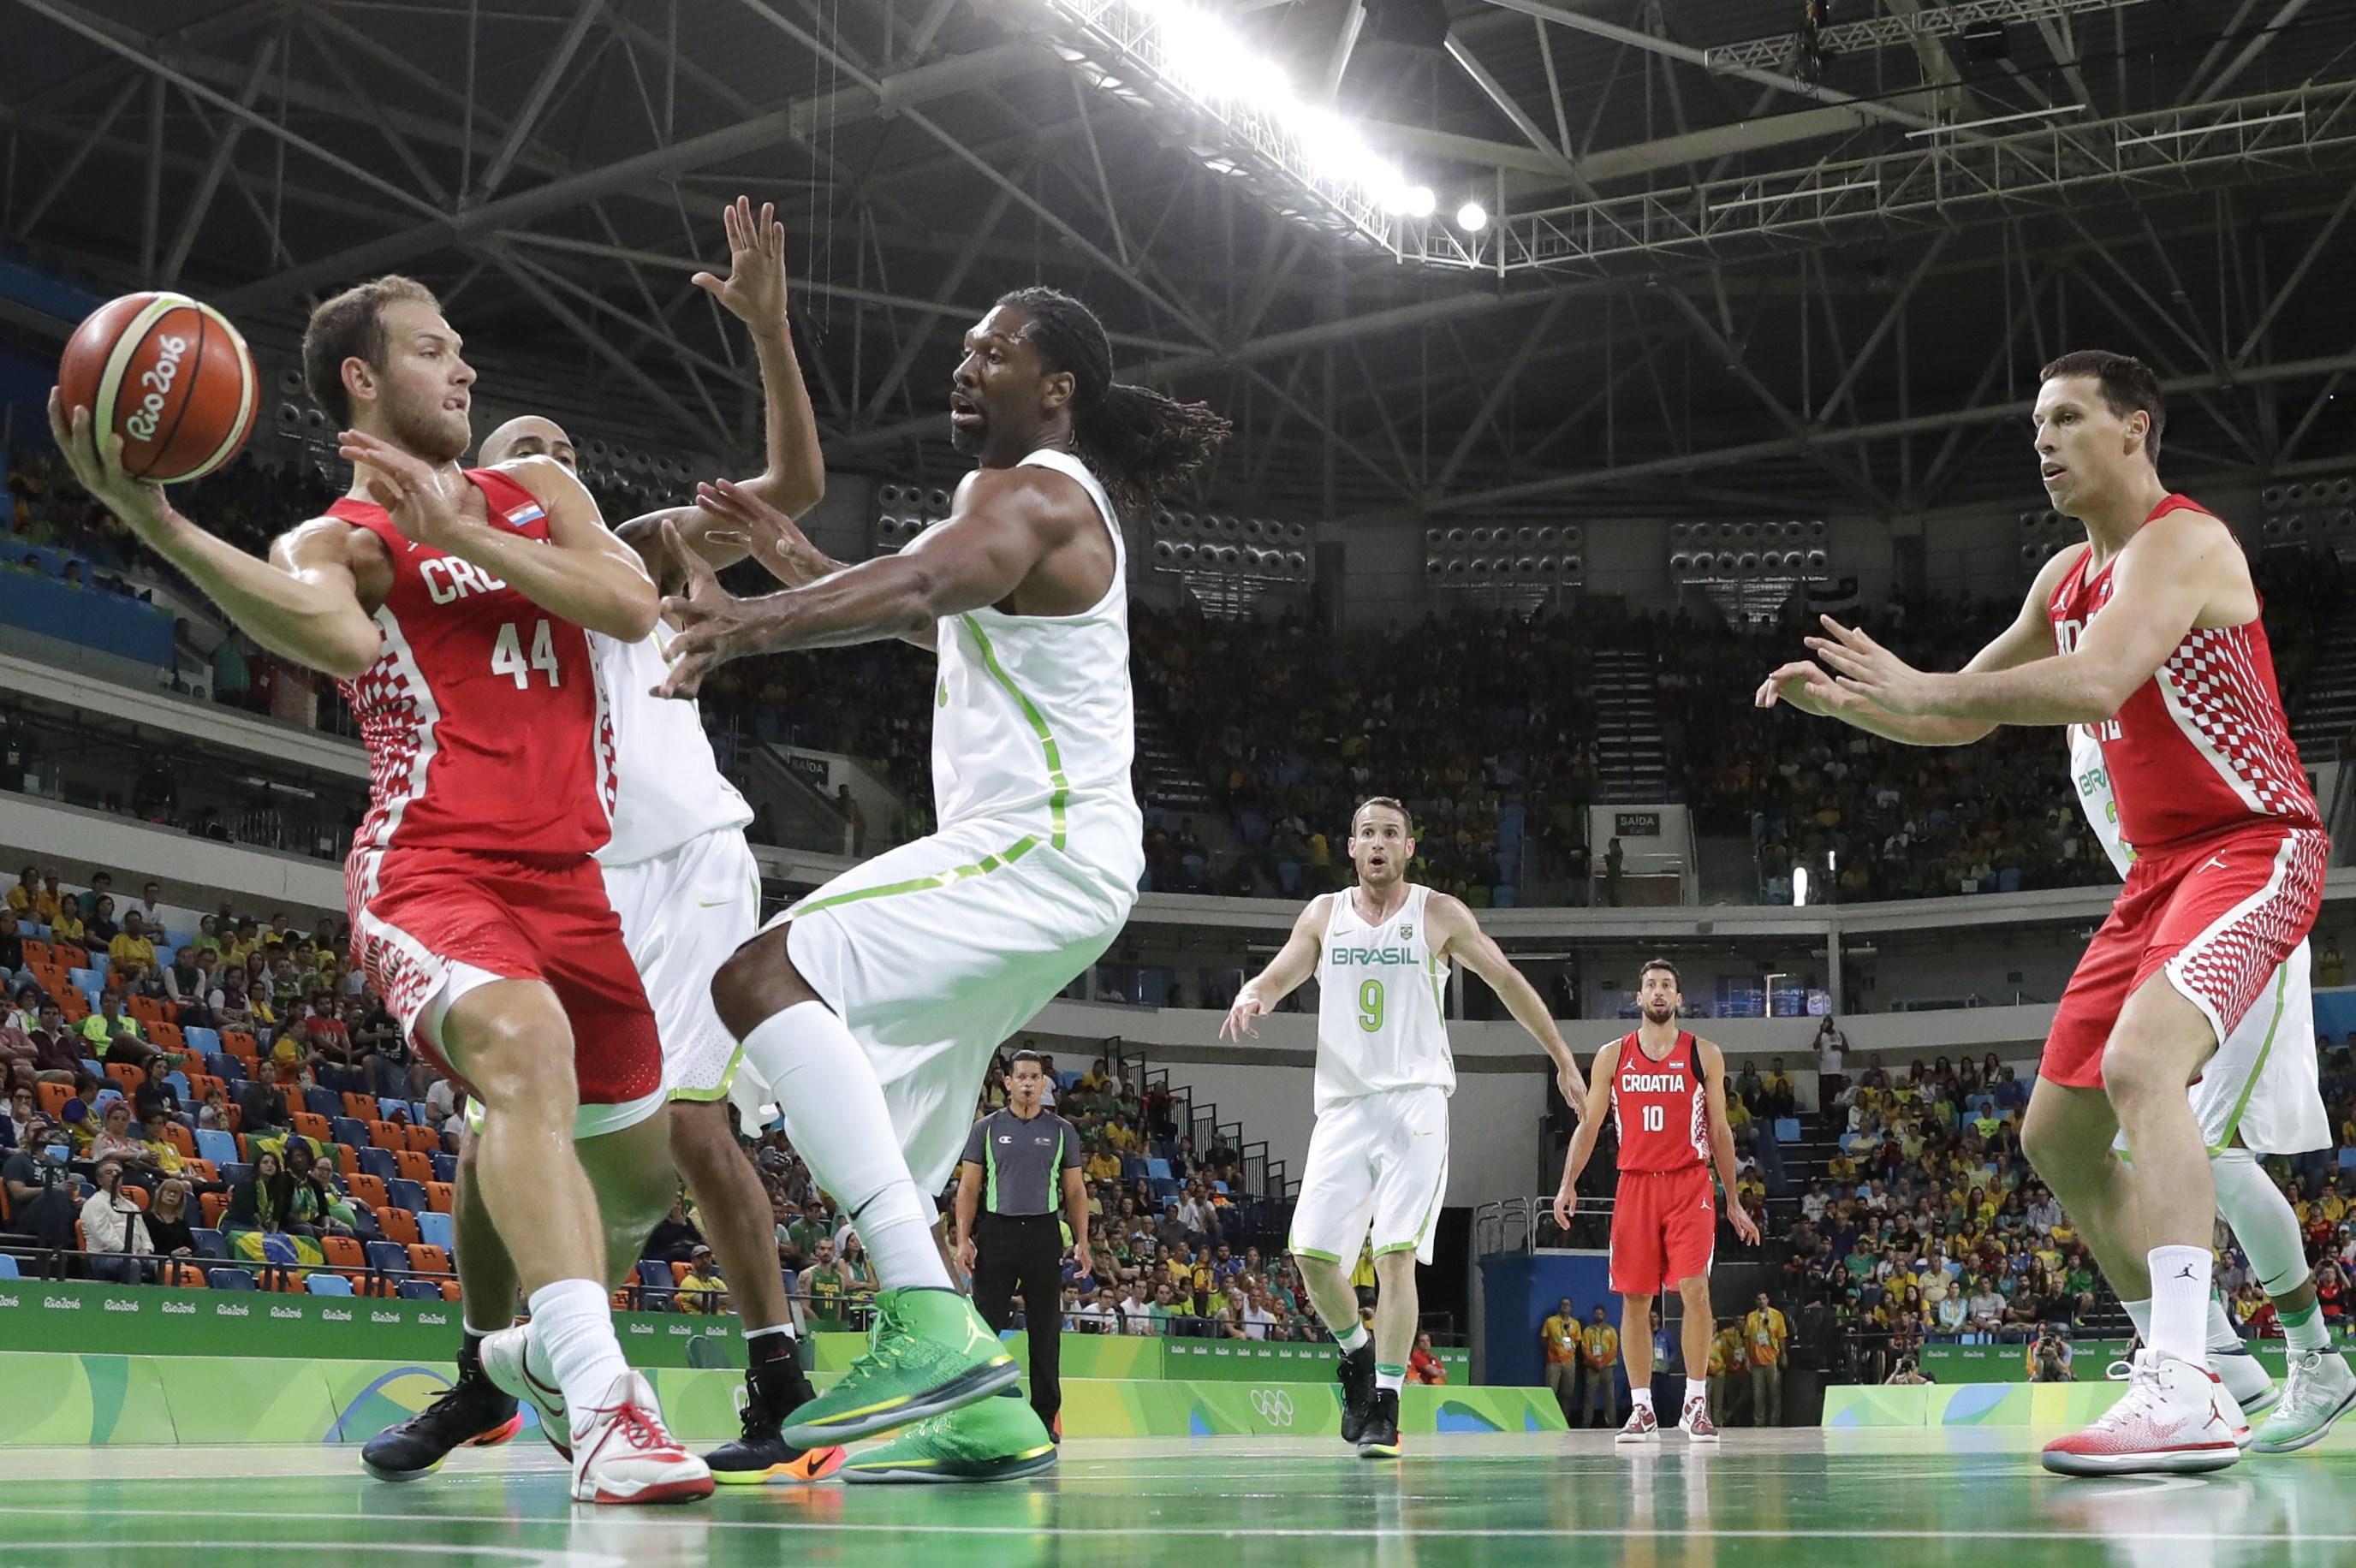 Croatia's Bojan Bogdanovic (44) passes the ball around Brazil's Nene Hilario (13) during a men's basketball game at the 2016 Summer Olympics in Rio de Janeiro, Brazil, Thursday, Aug. 11, 2016. (AP Photo/Eric Gay)